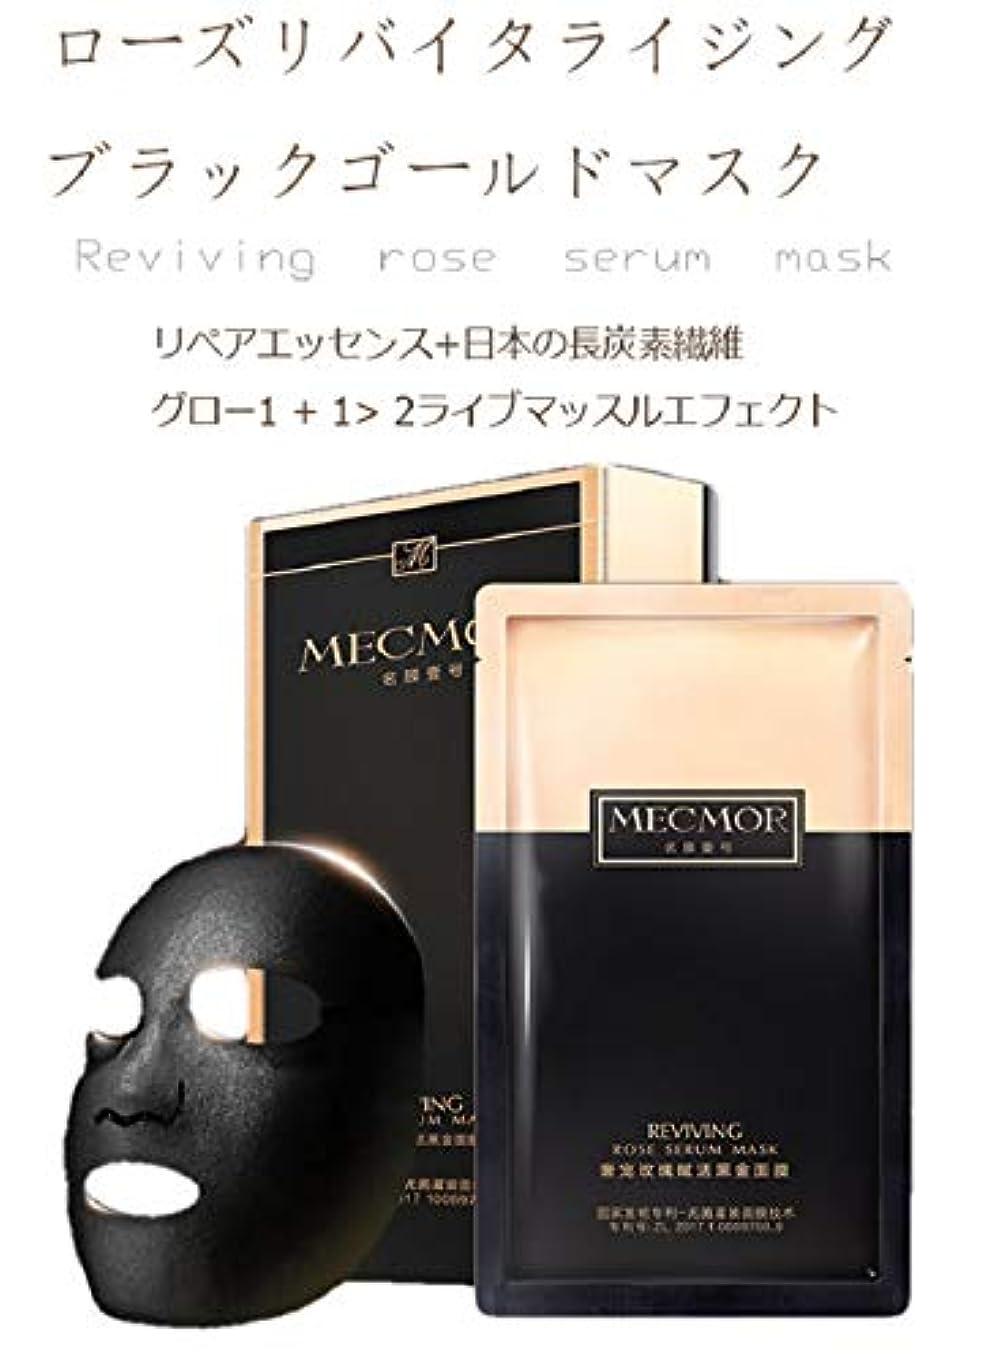 MECMORローズブラックゴールドマスク おすすめ無添加エッセンスマスク 肌荒れマスキングアンチエイジング